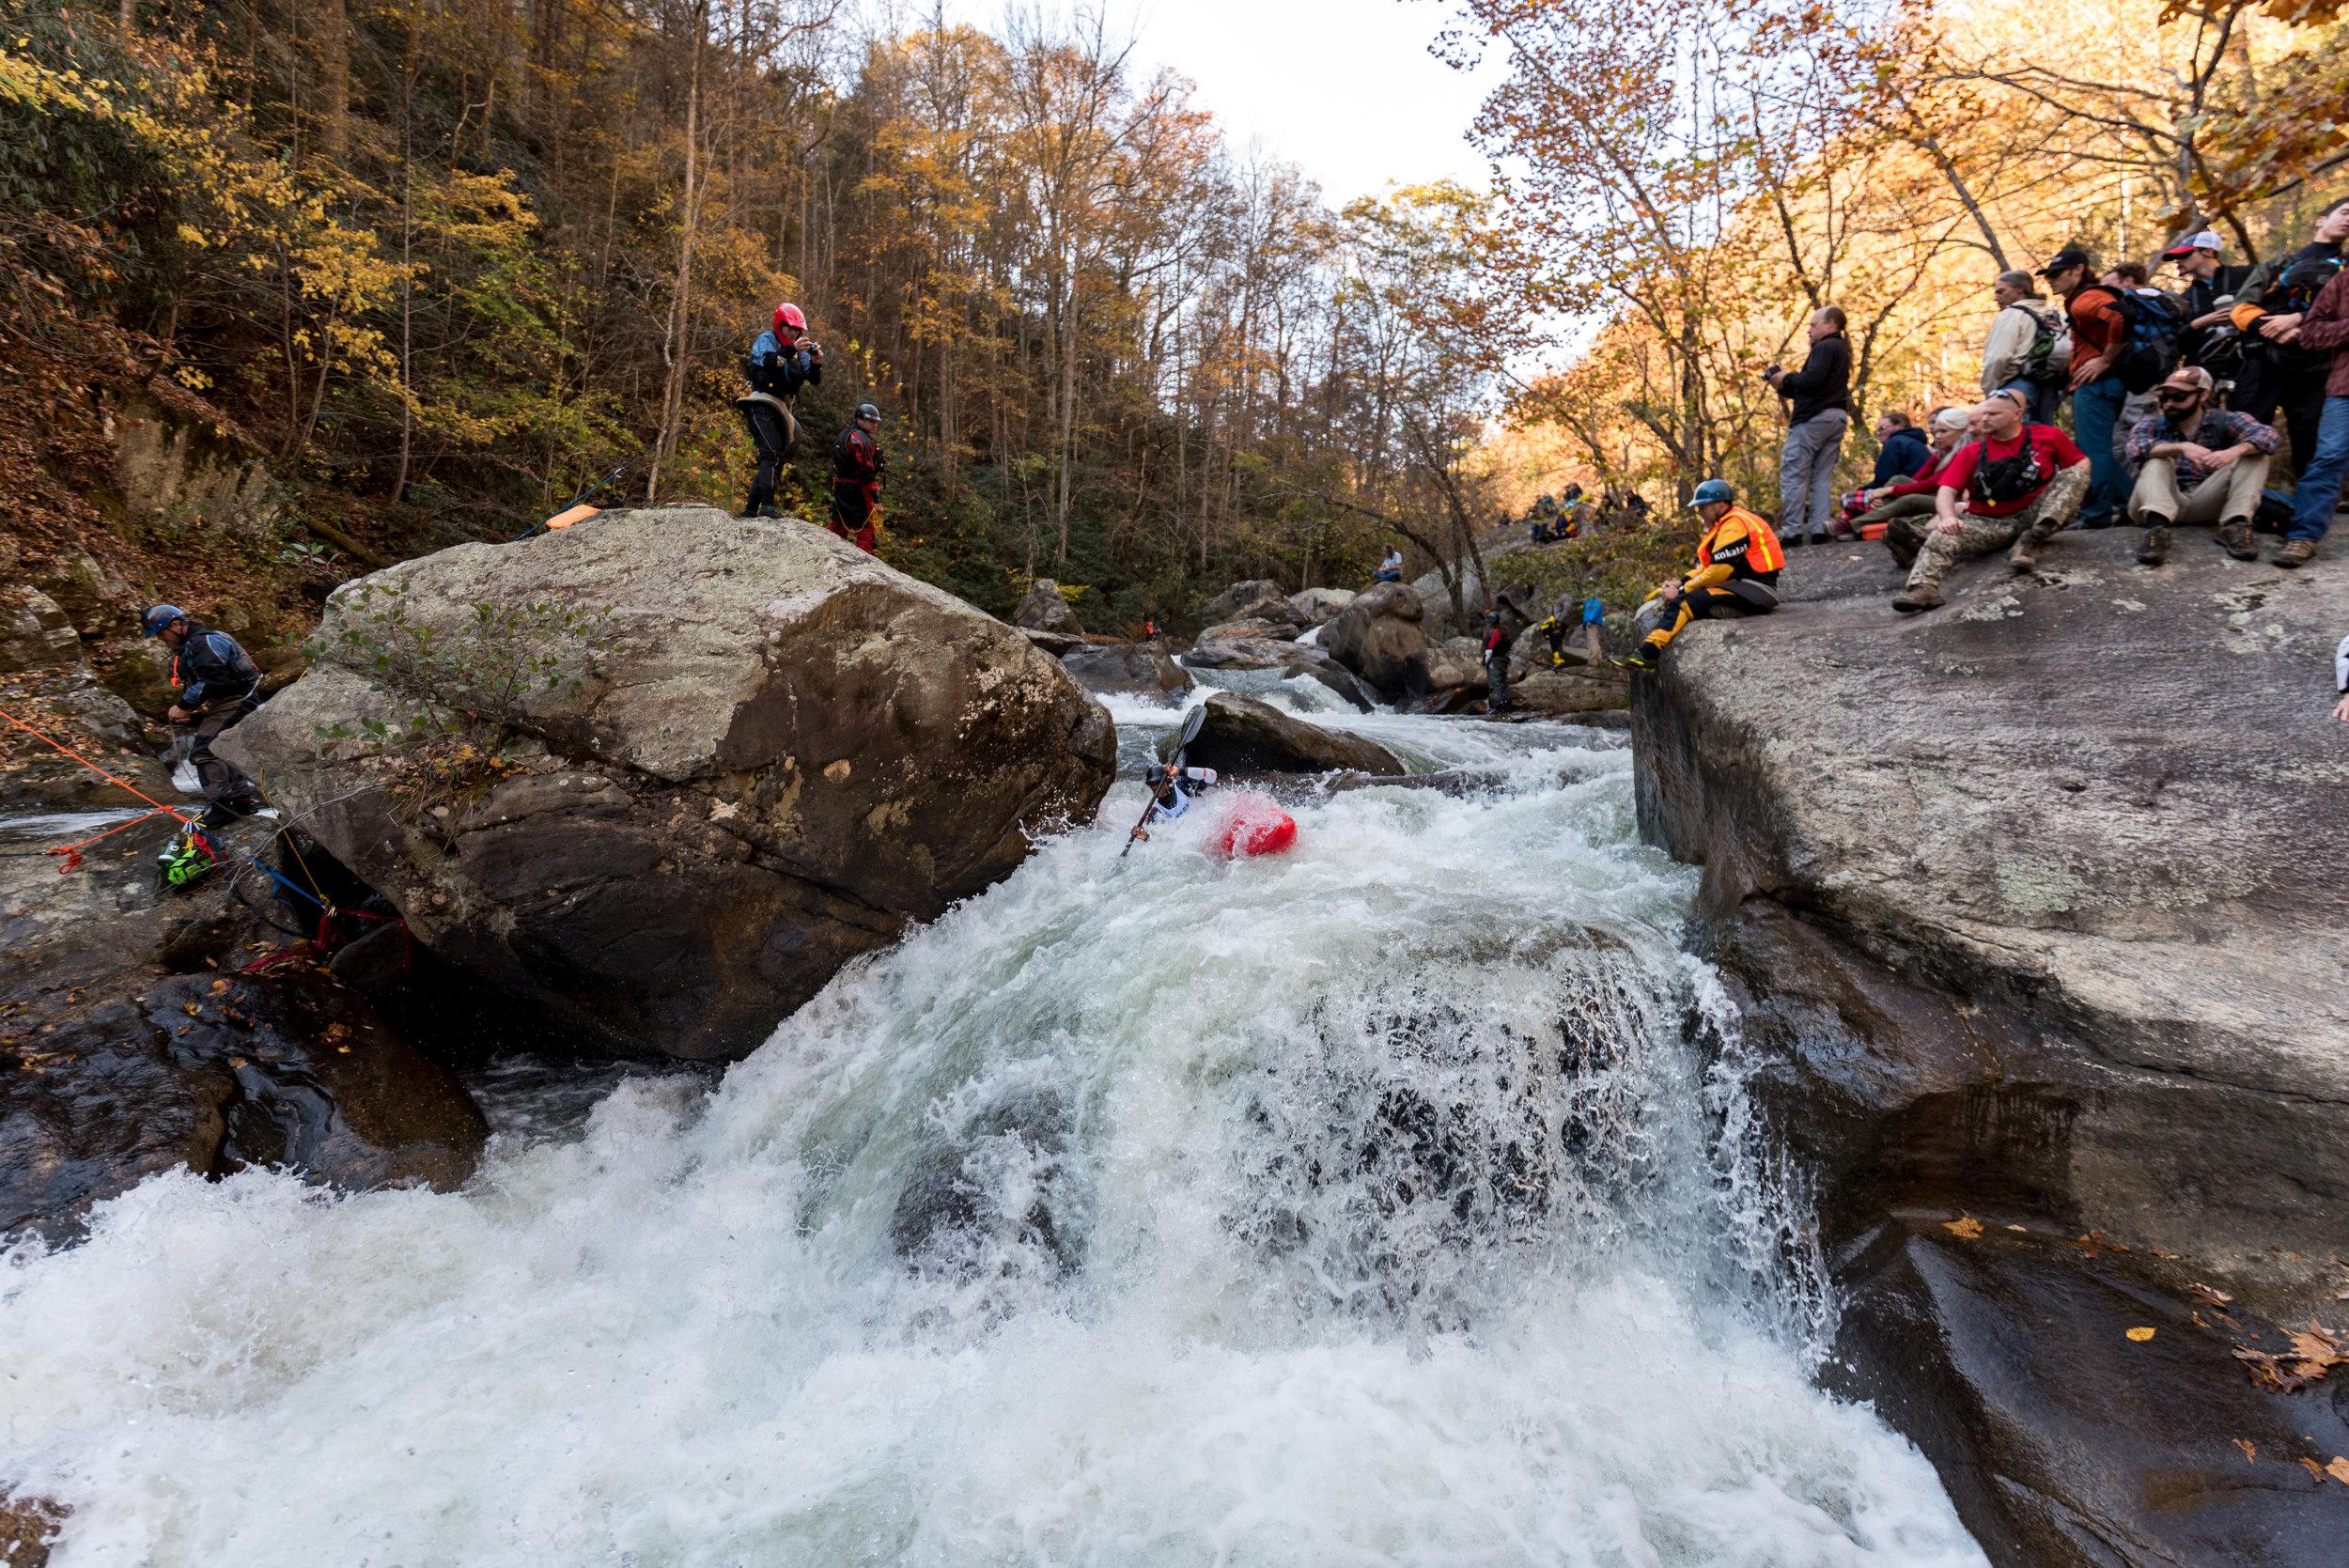 Rashid Clifton racing through a crux rapid on the Green River Narrows near Saluda, North Carolina (Photo credit: Chad Blotner)